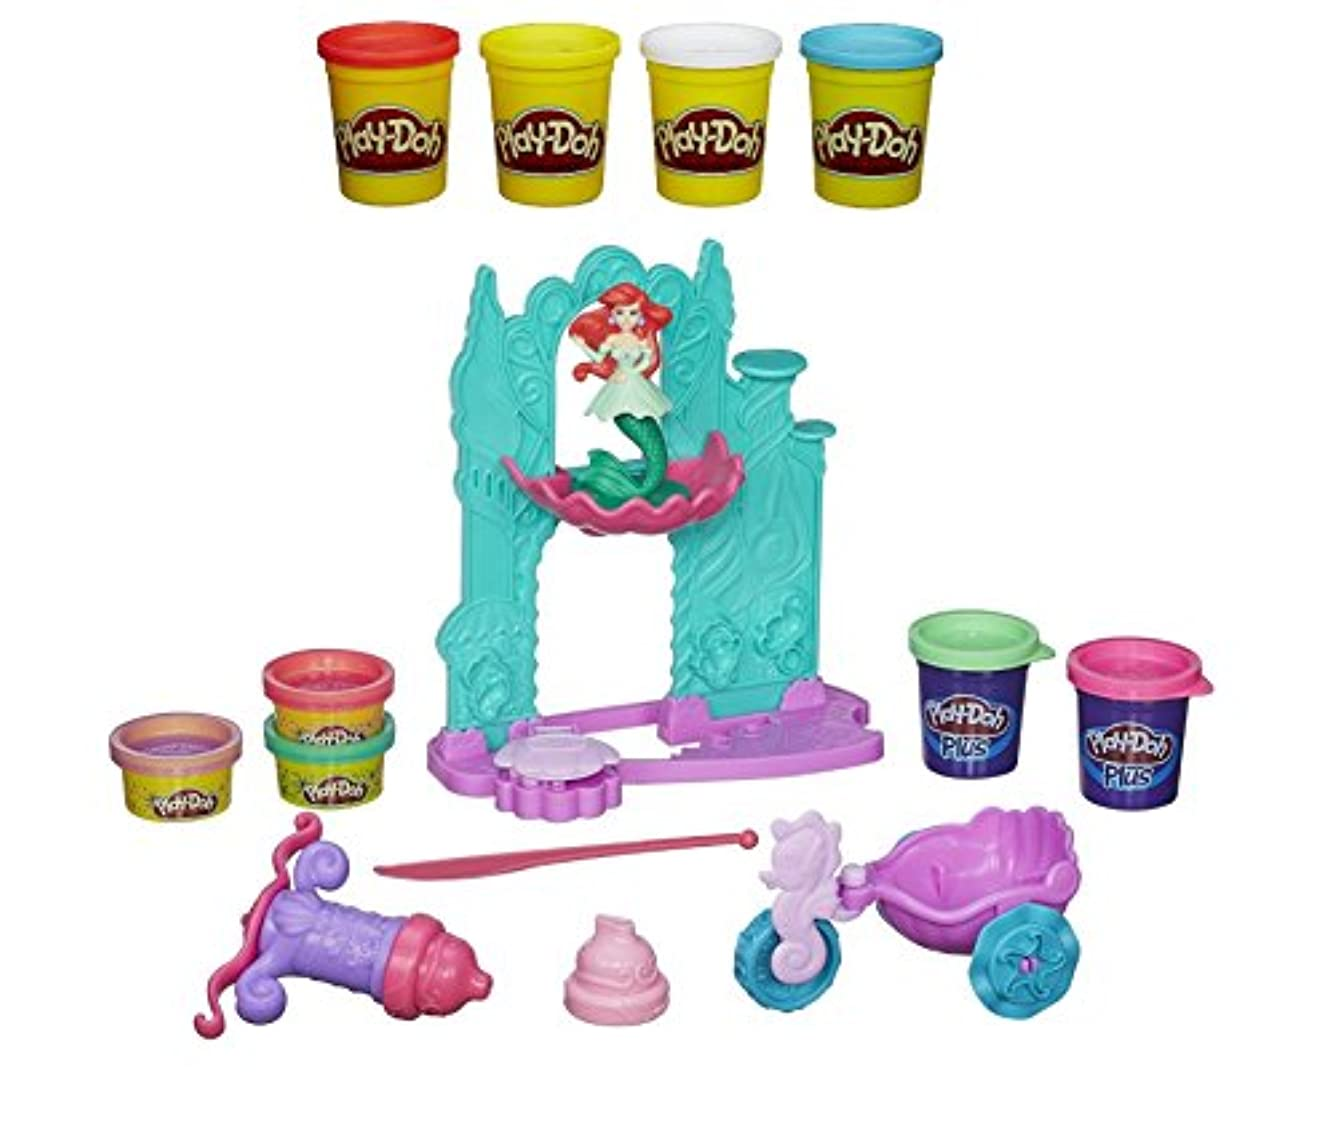 Play-Doh Disney Princess Ariels Undersea Castle Playset + Play-Doh 4-Pack of Colors 20oz - Bundle